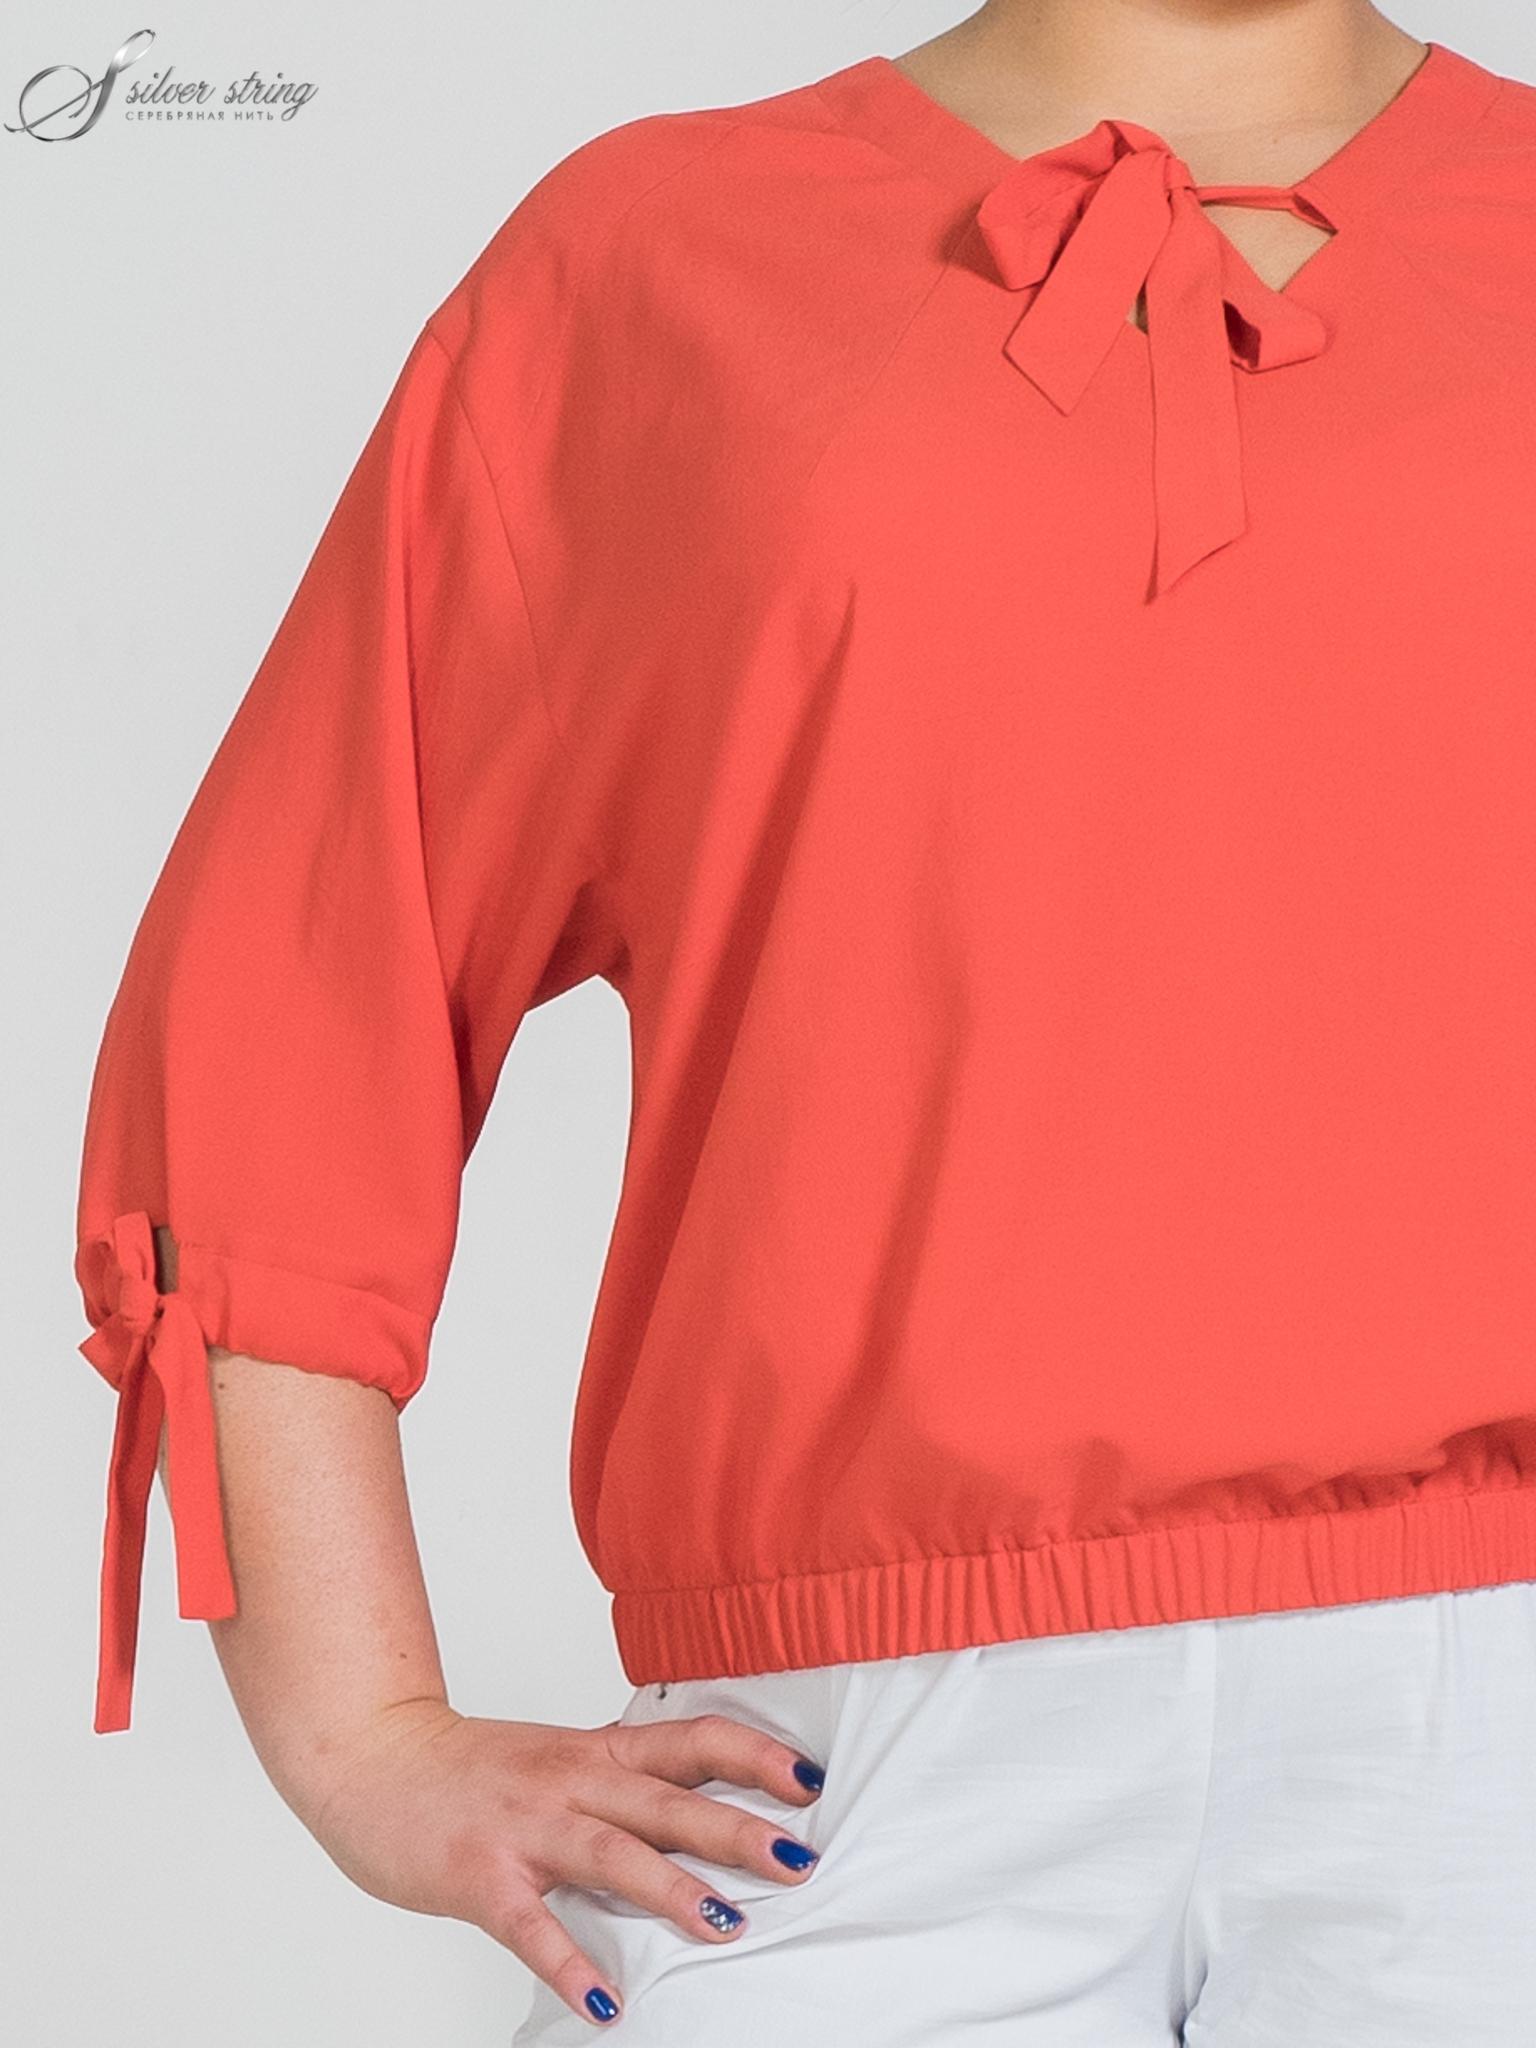 Блузка Со Спущенным Рукавом В Самаре